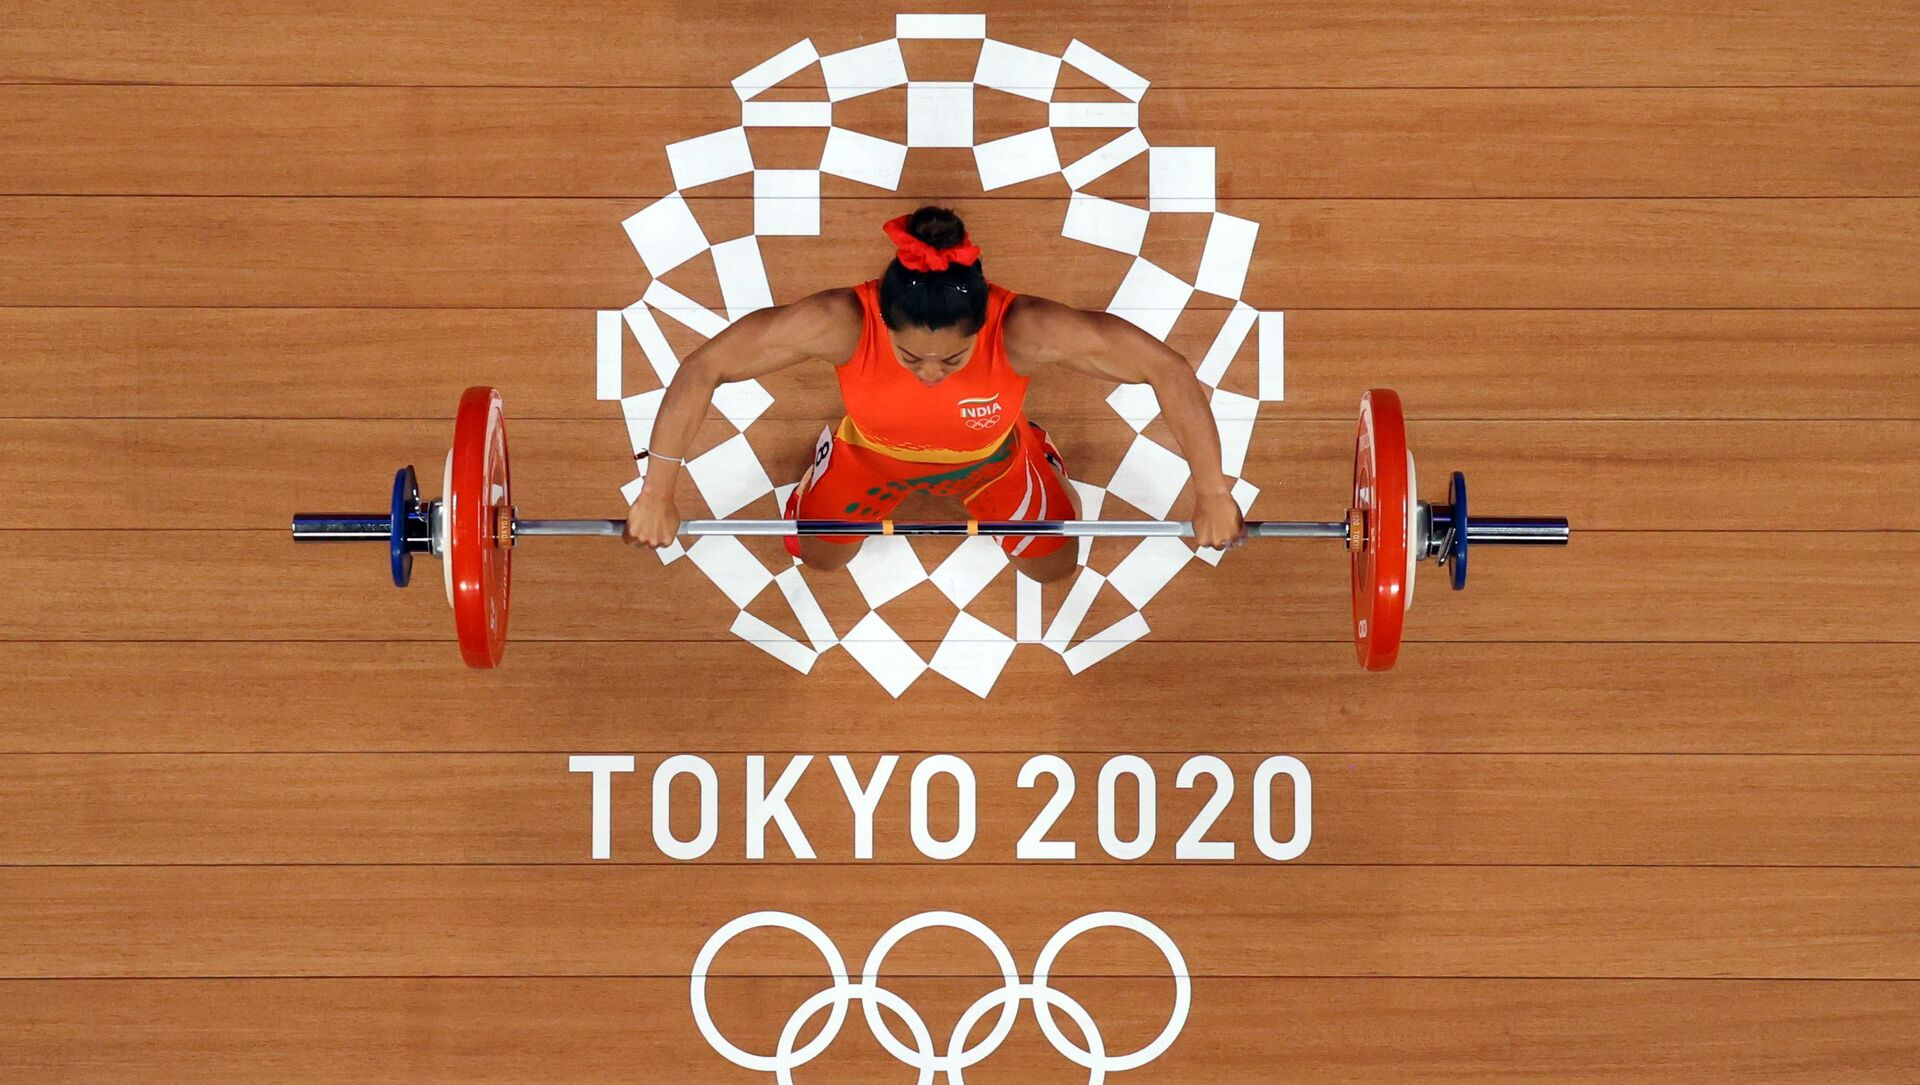 Tokyo 2020 Olympics - Weightlifting - Women's 49kg - Group A - Tokyo International Forum, Tokyo, Japan - July 24, 2021.  Mirabai Chanu Saikhom of India in action. Pool via REUTERS/Chris Graythen - Sputnik International, 1920, 25.07.2021